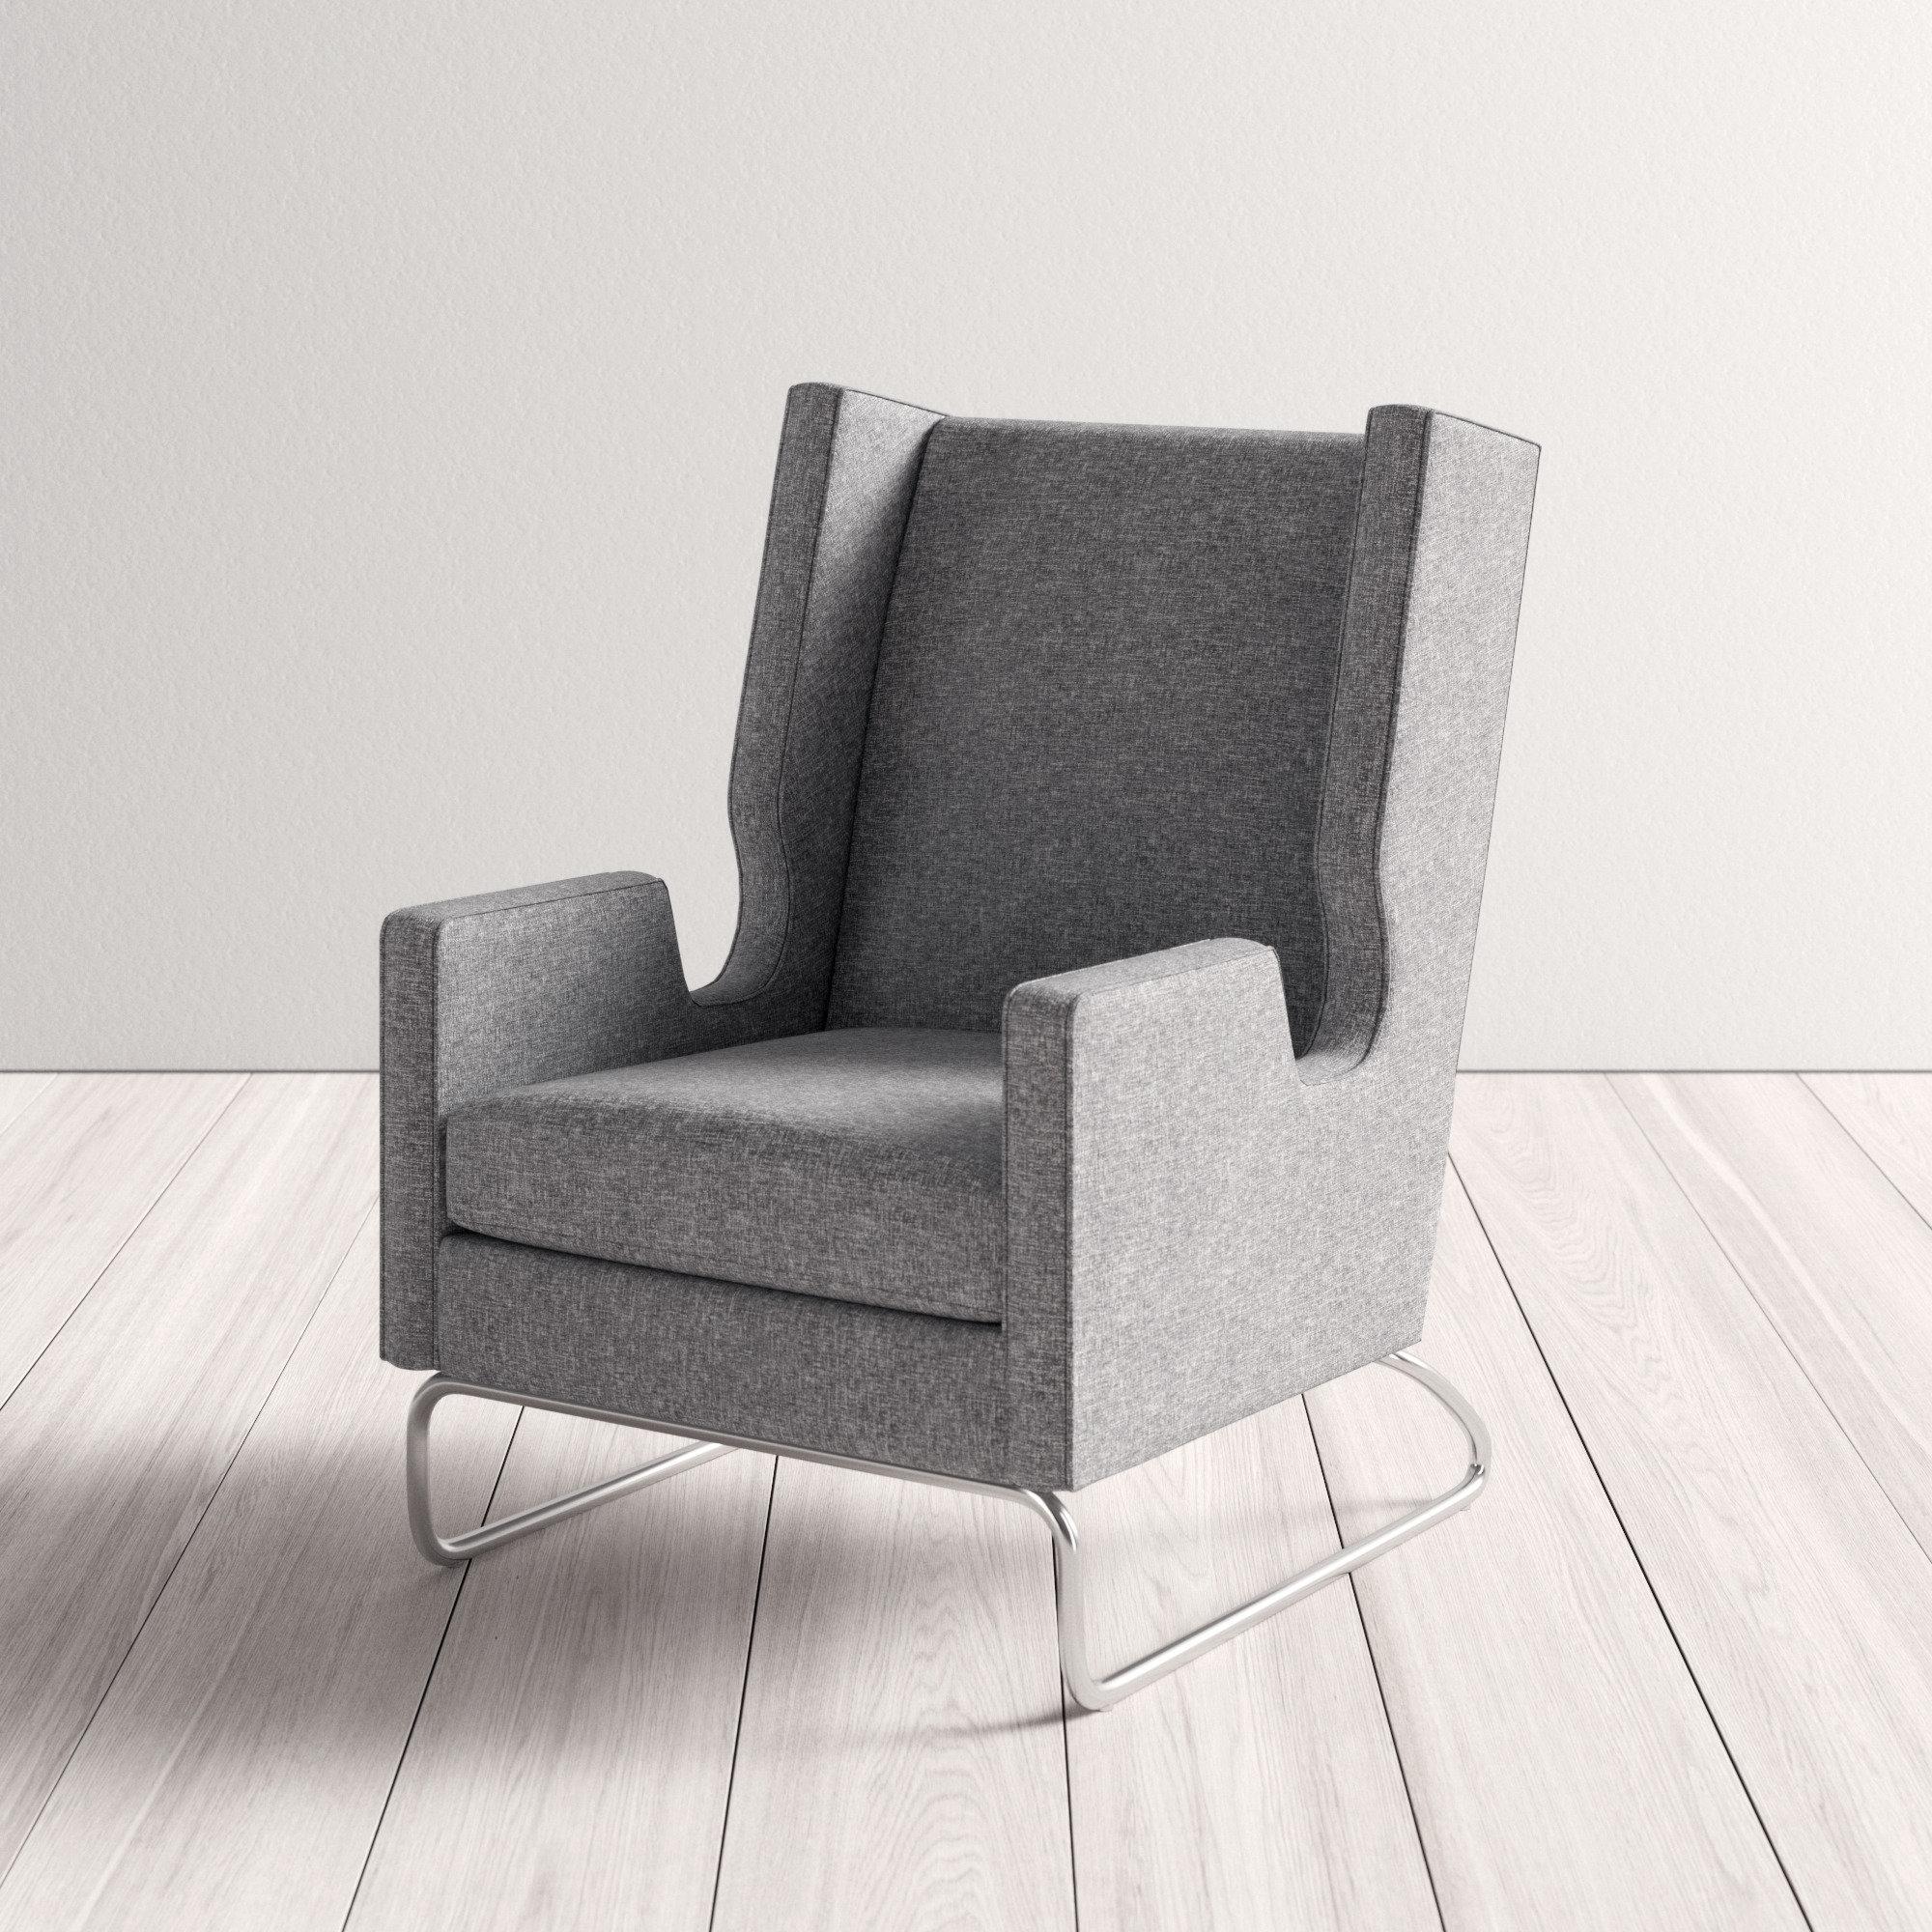 Tremendous Danforth Wingback Chair Customarchery Wood Chair Design Ideas Customarcherynet